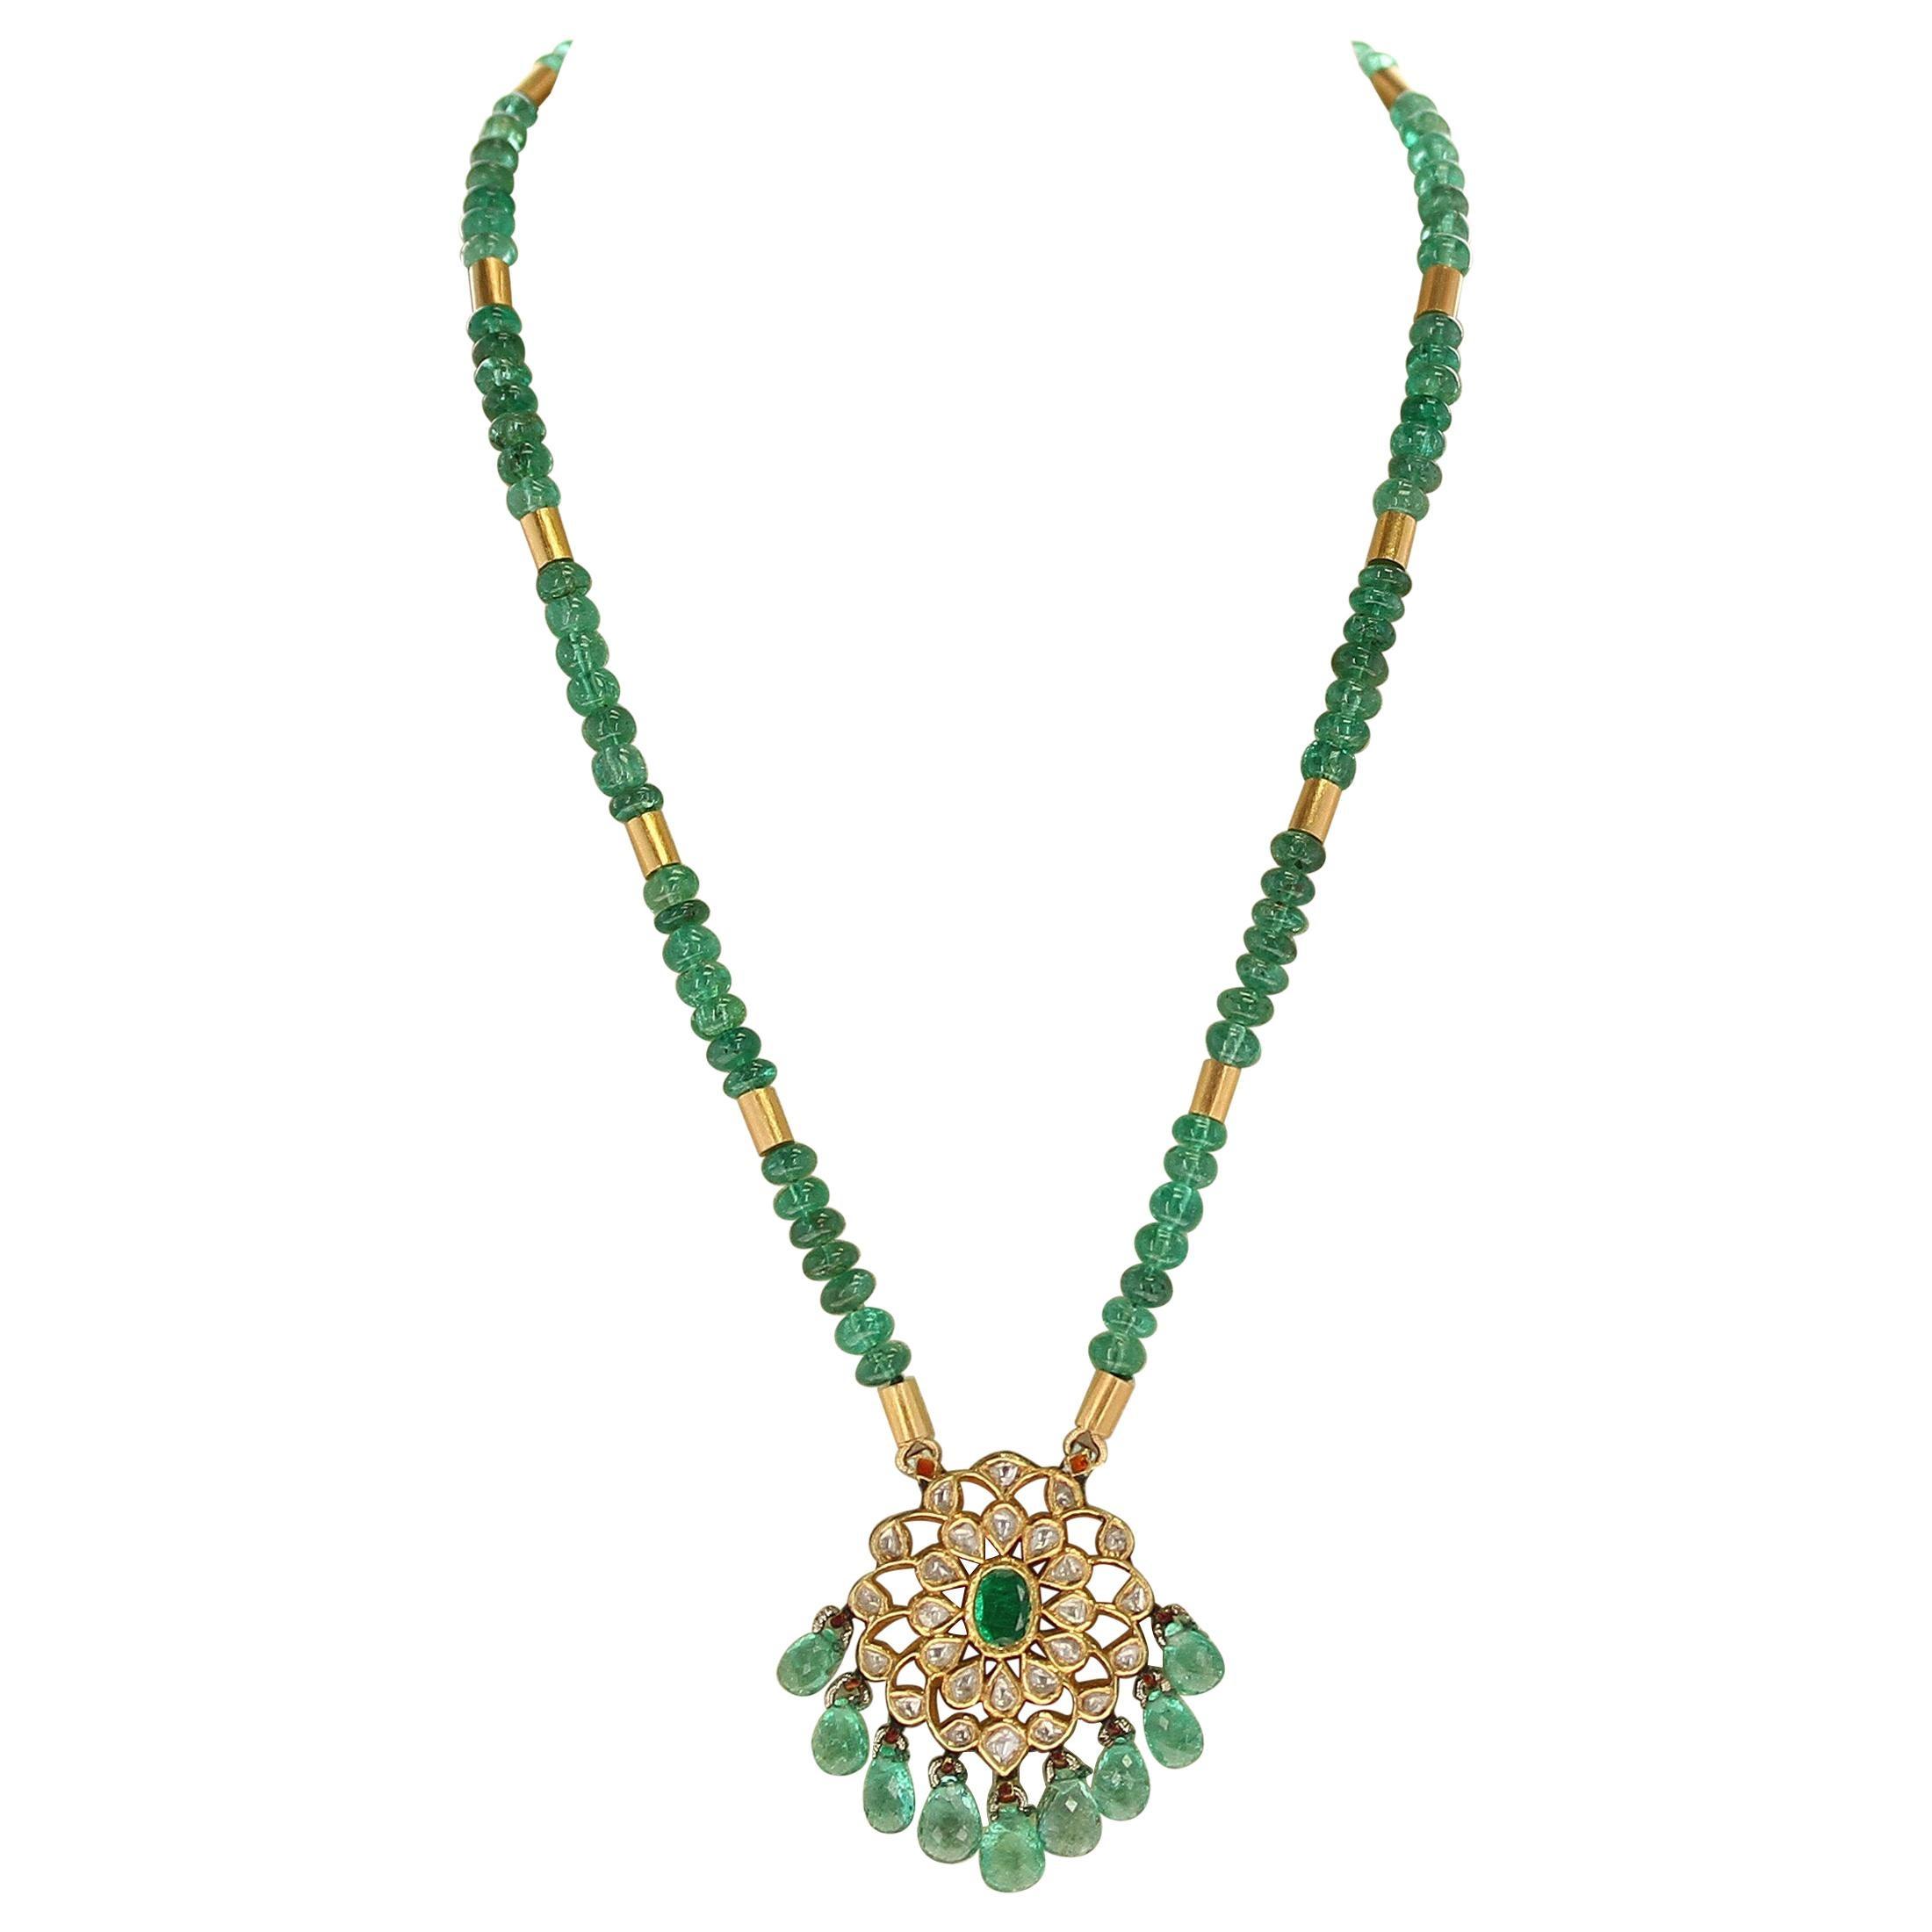 Genuine & Natural Plain Emerald Beads Necklace and Indian Kundan Enamel Pendant